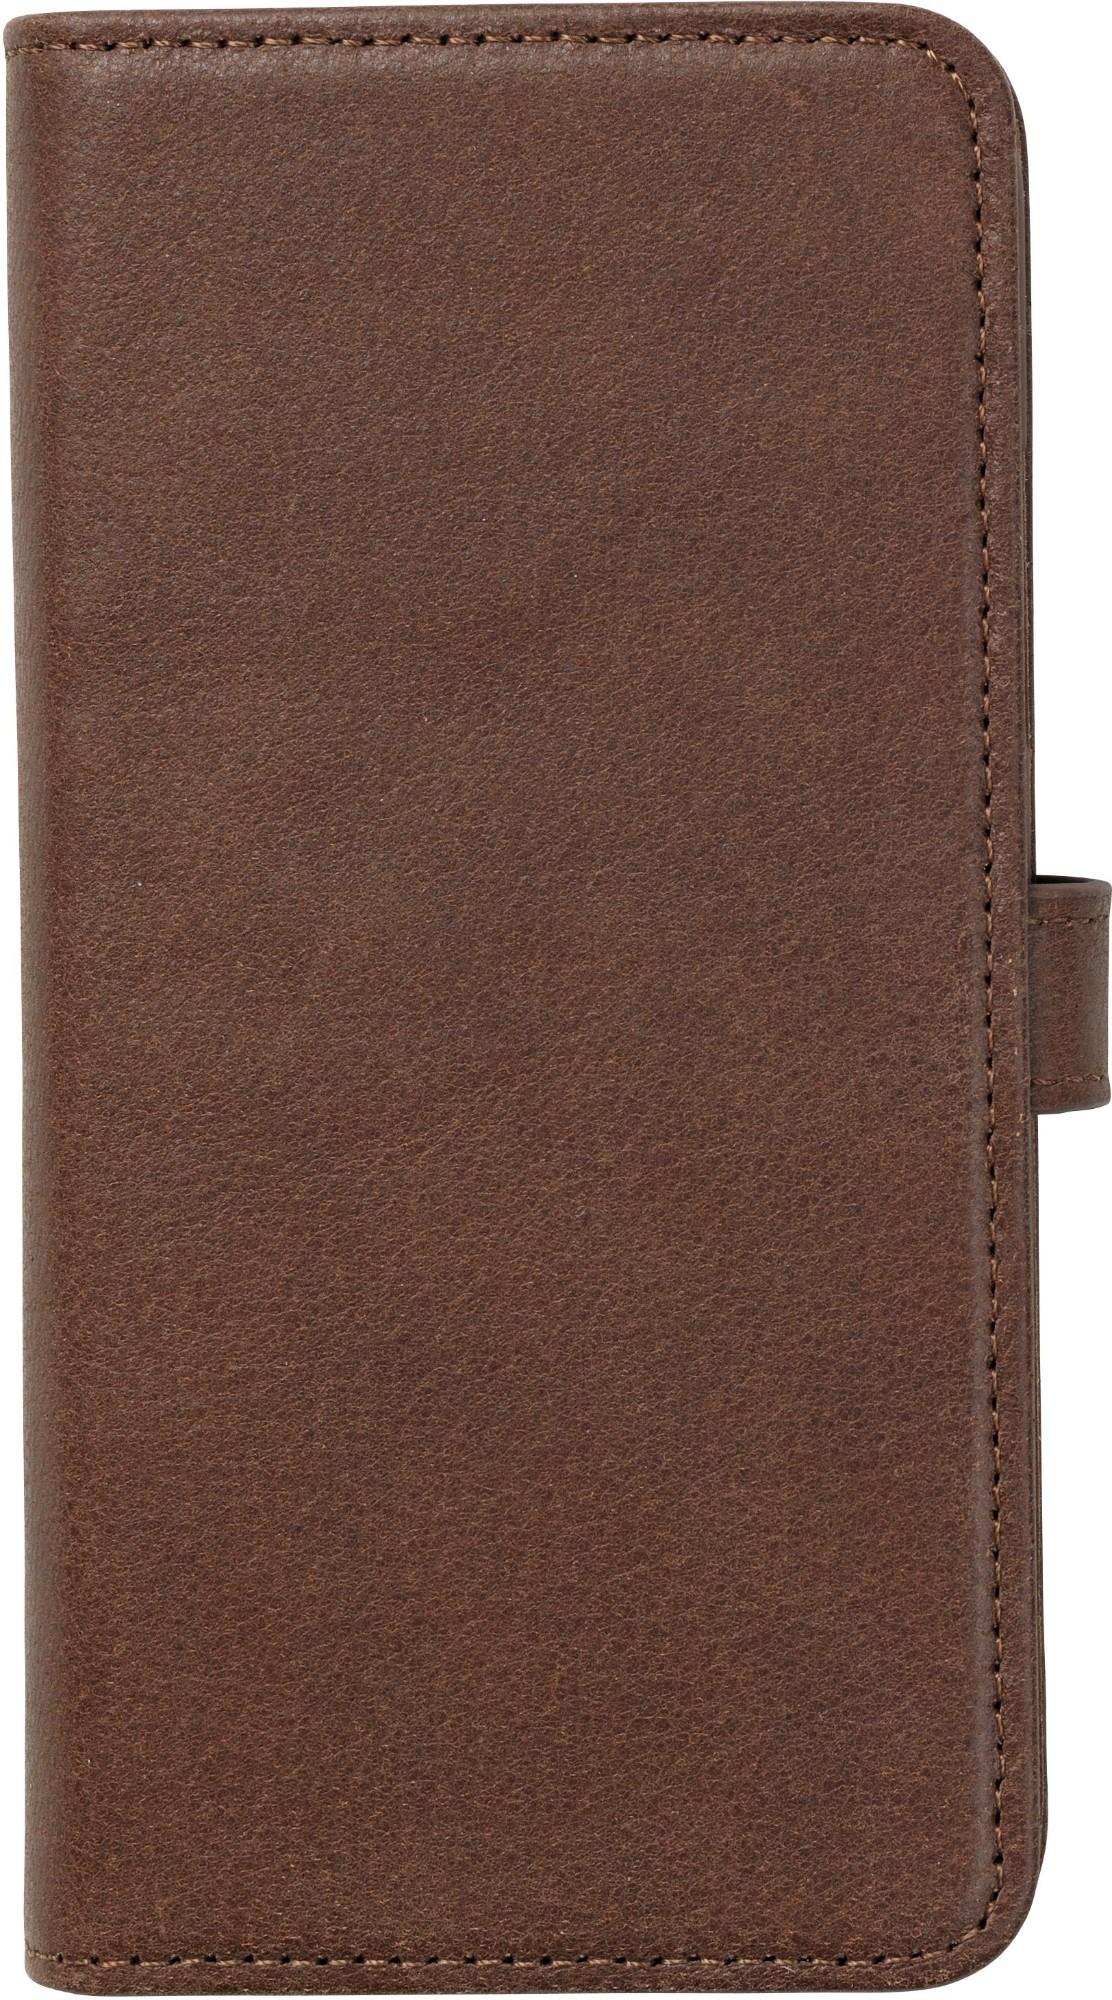 eSTUFF Iphone X Leather wallet mobile phone case Wallet case Brown